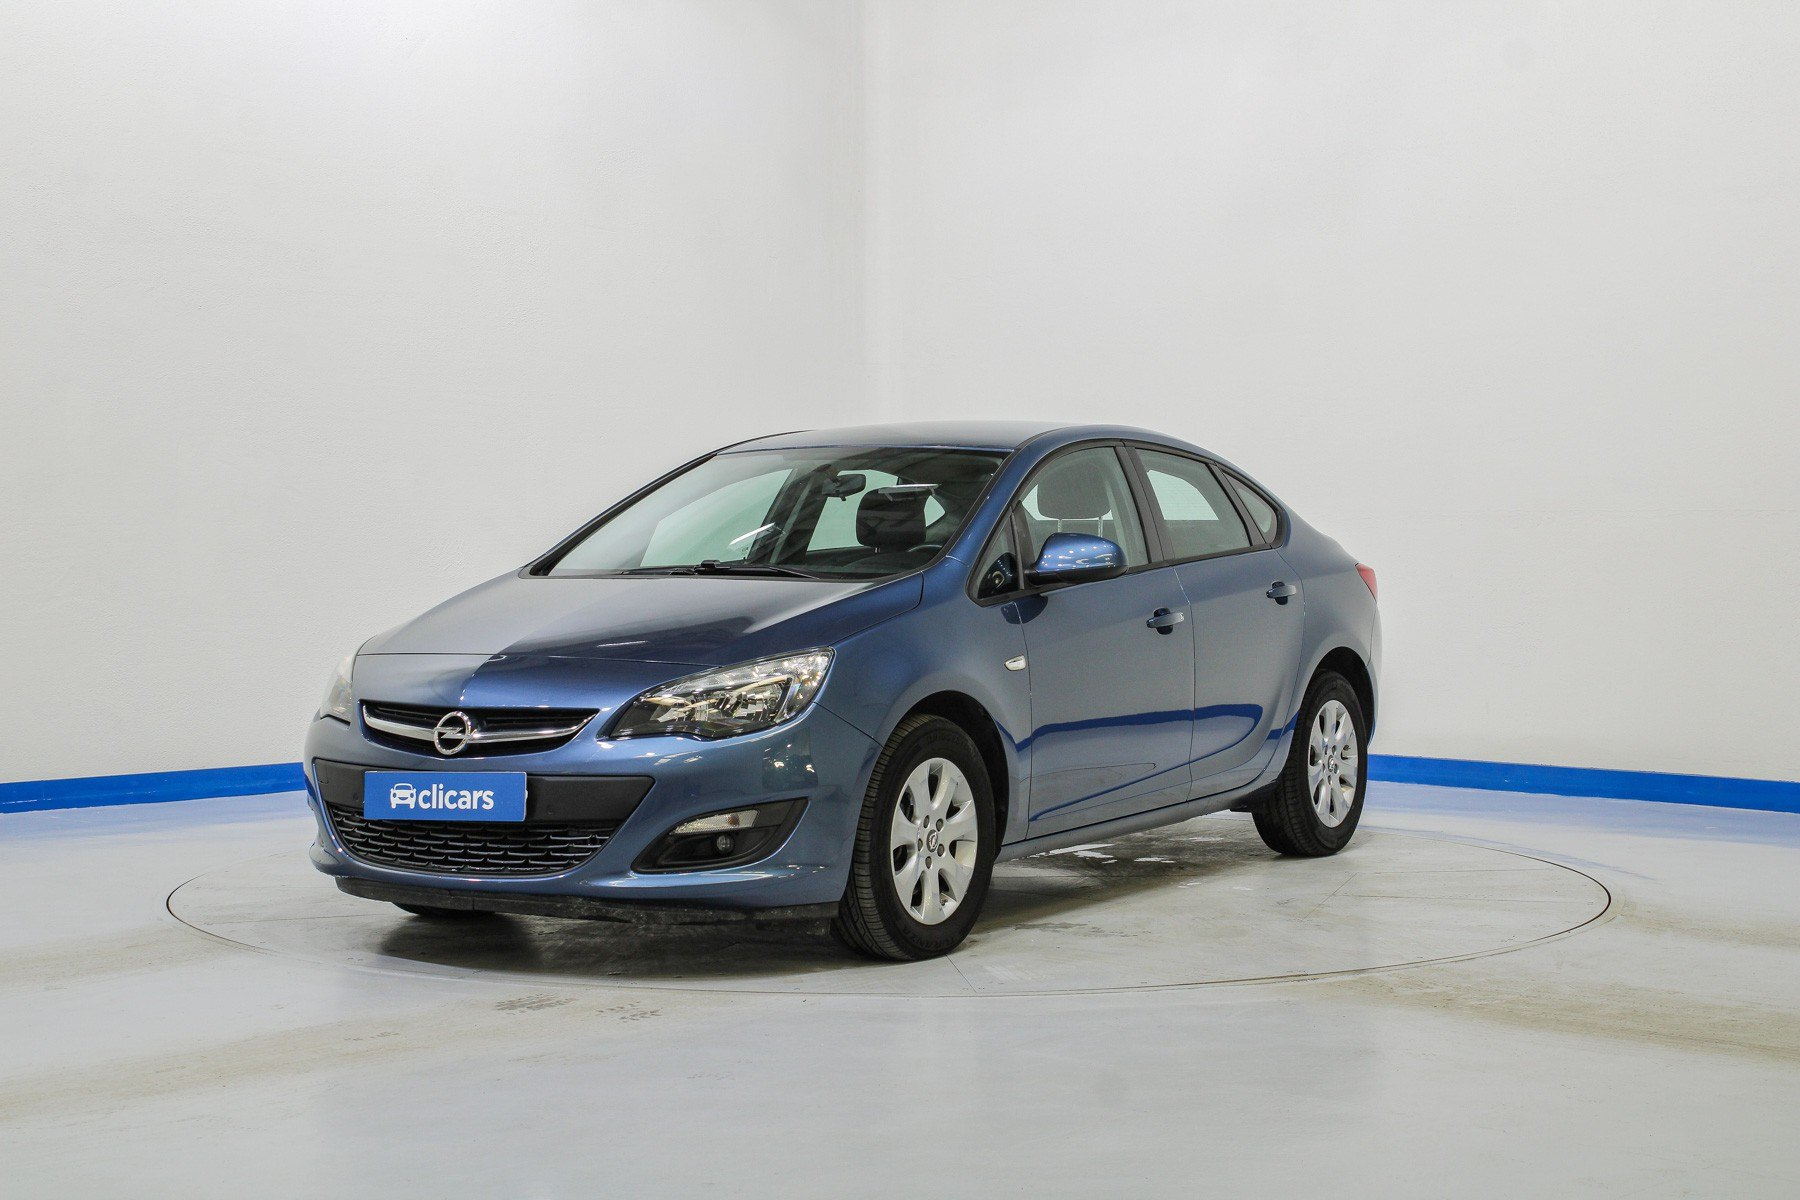 Opel Astra Diésel 1.6 CDTi S/S 100kW (136CV) Elegance 1